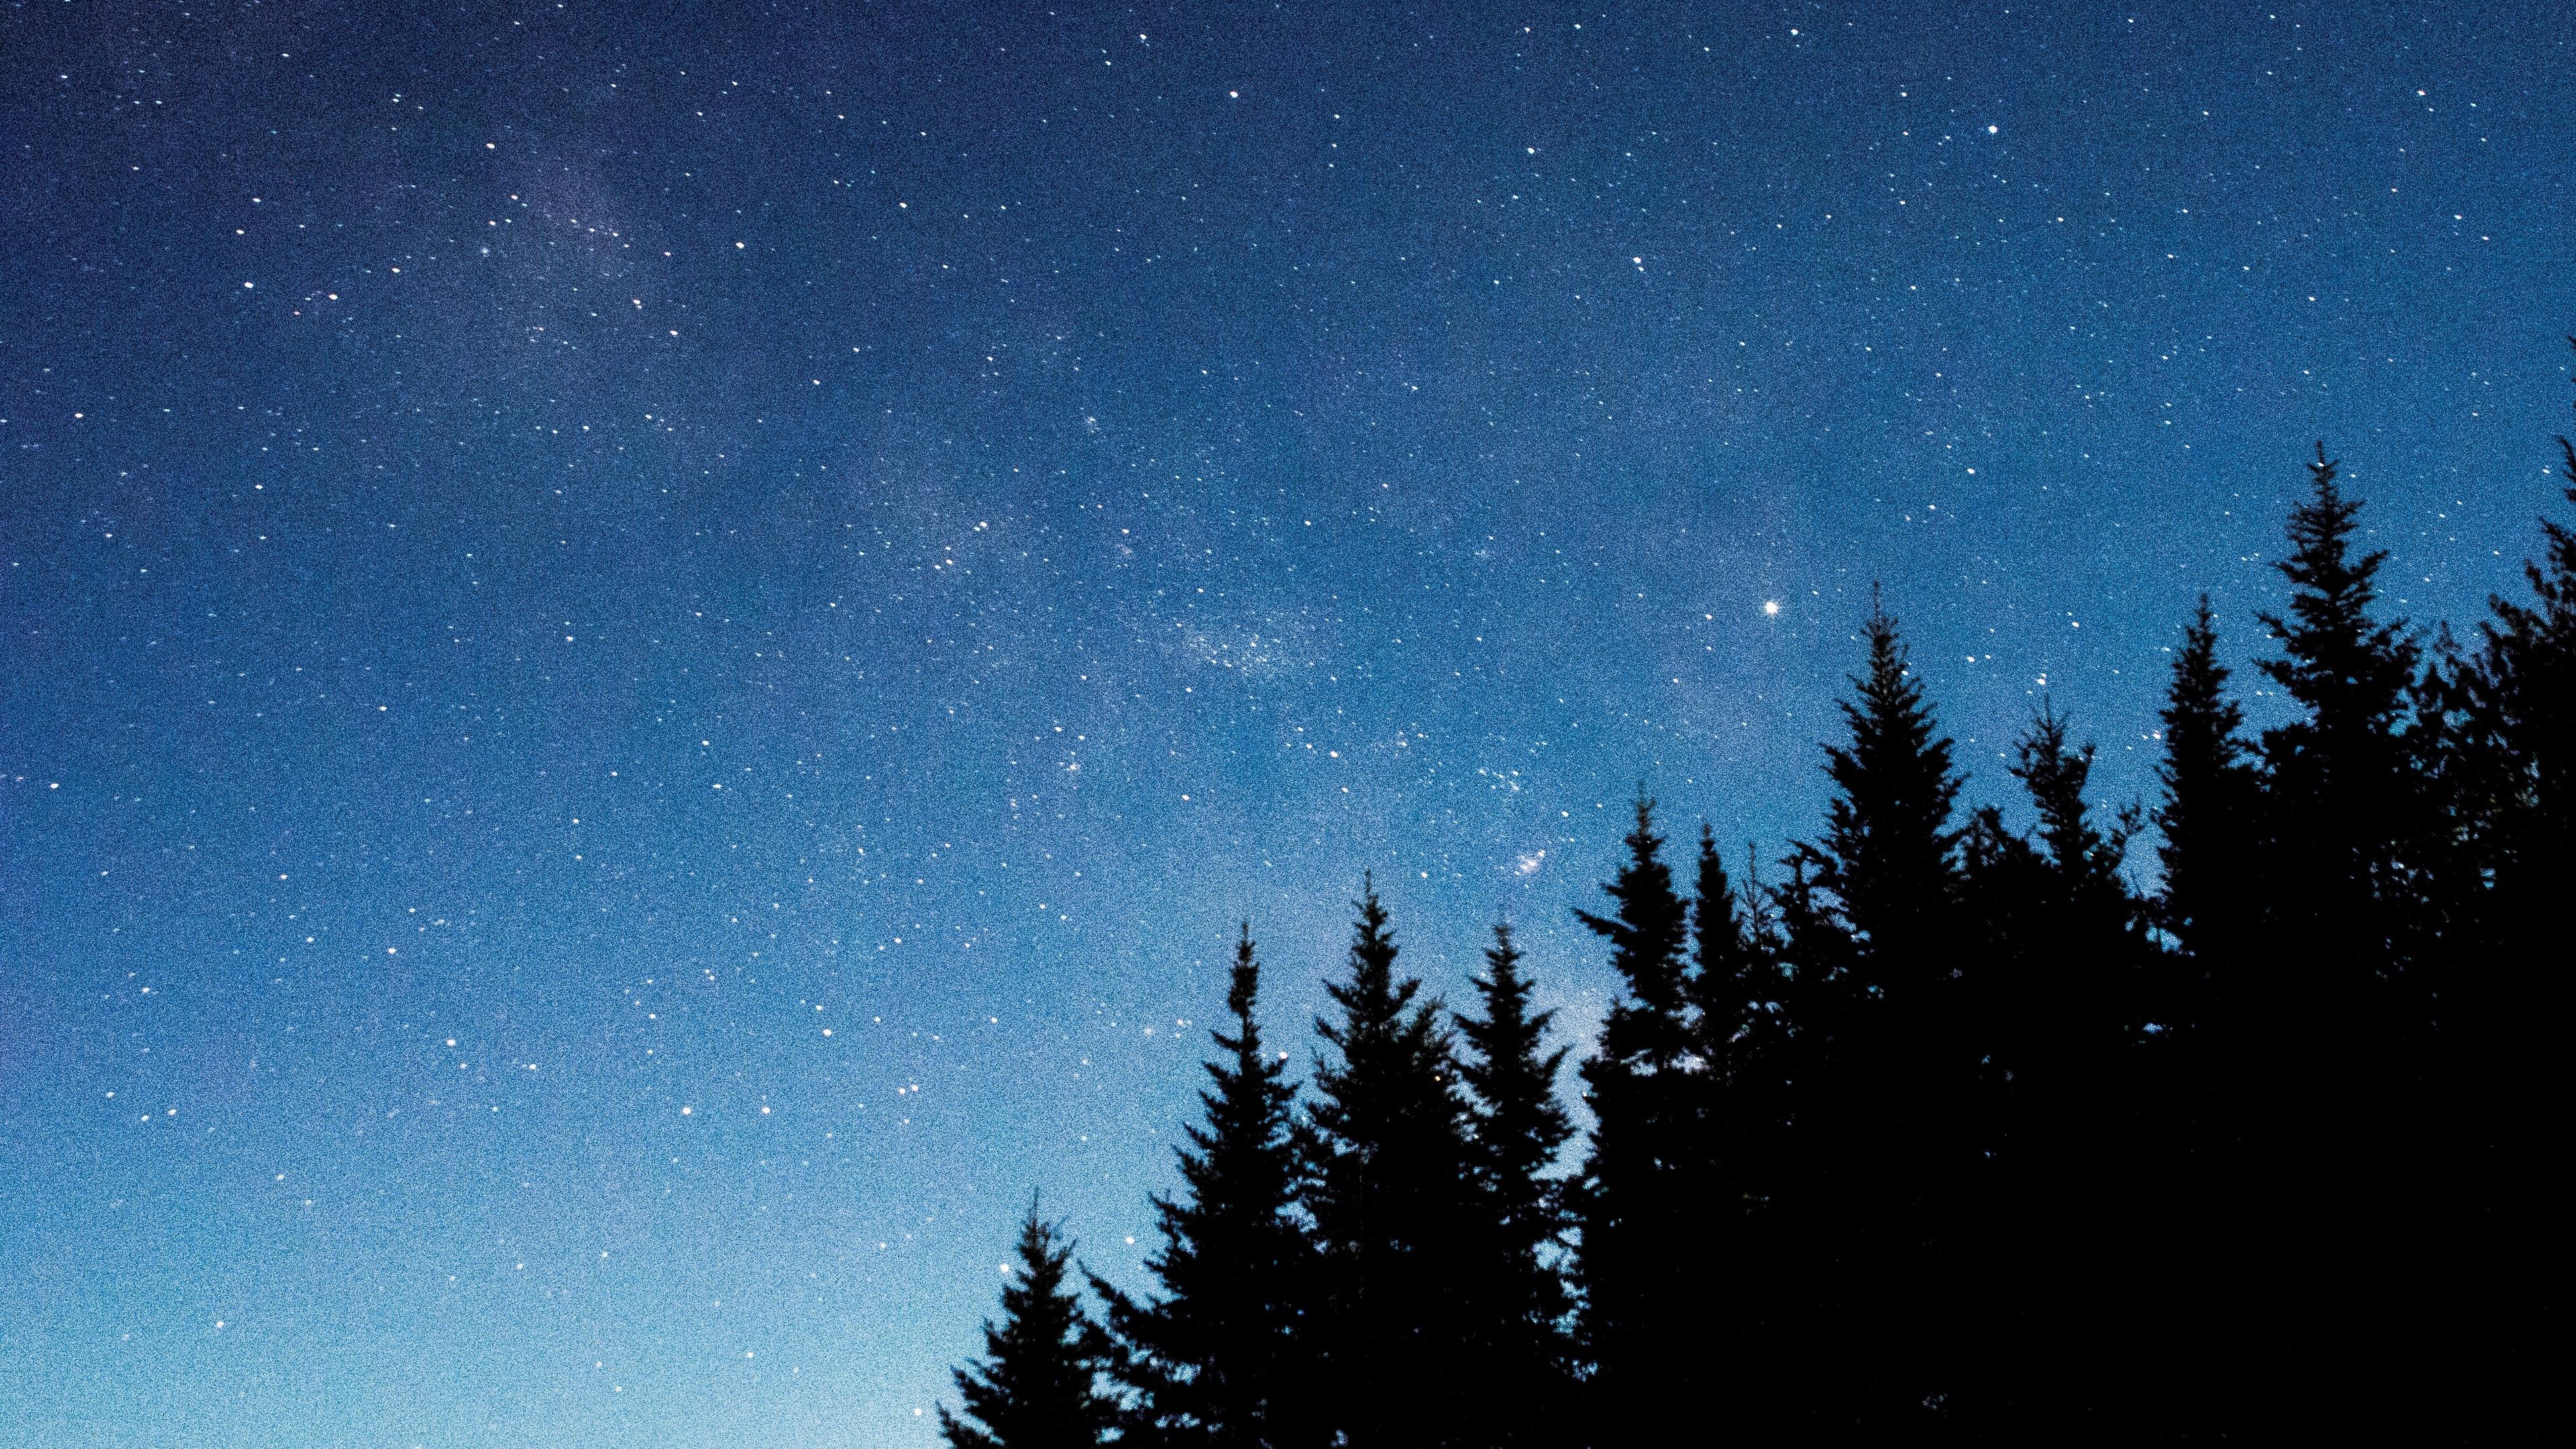 starry sky trees fir night 4k 1540575328 - starry sky, trees, fir, night 4k - Trees, starry sky, fir